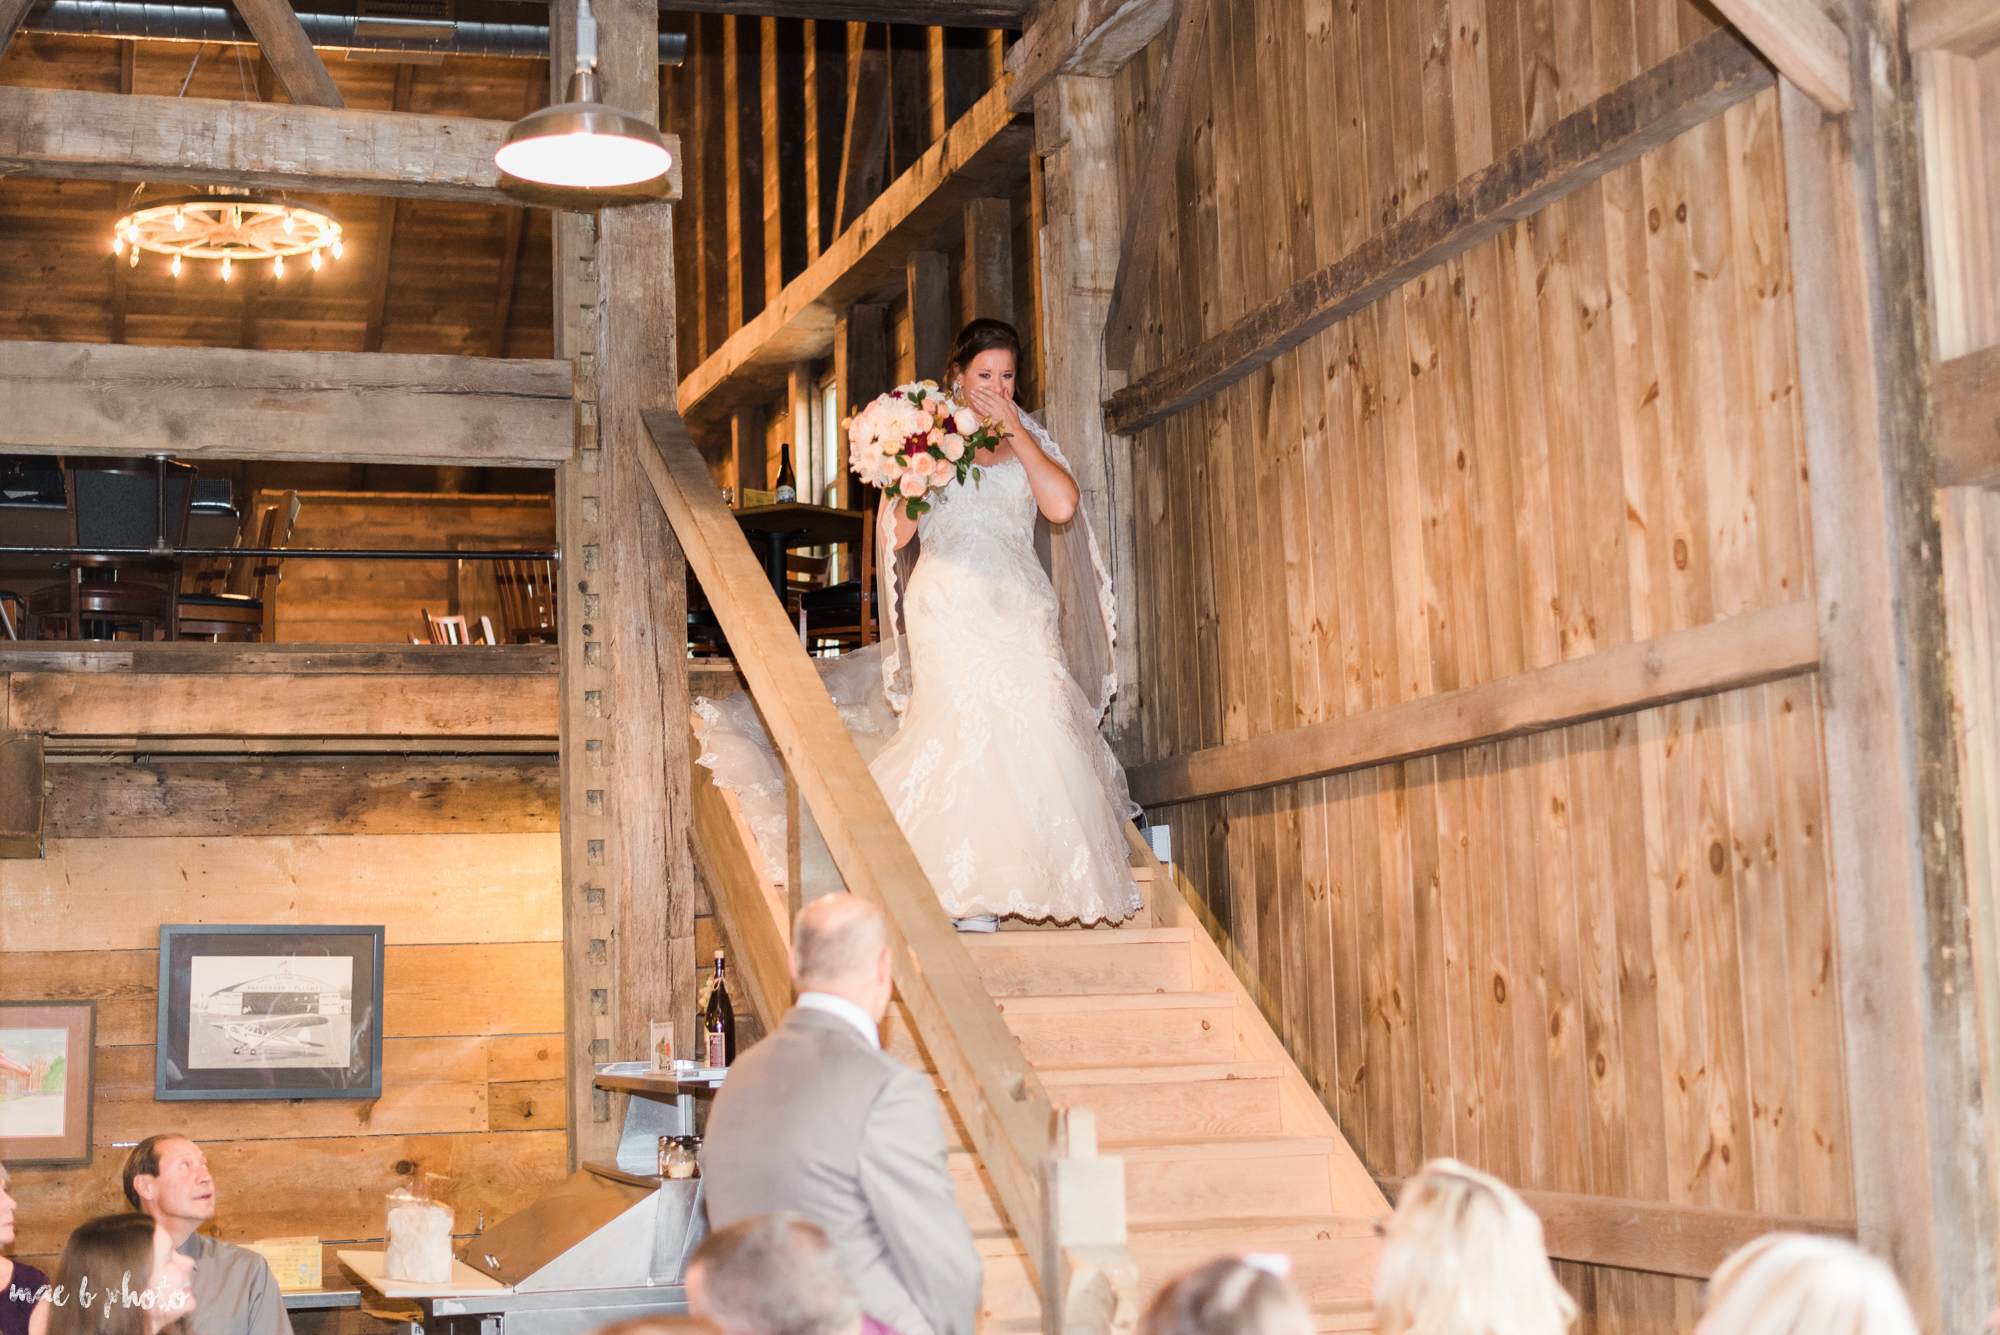 Sarah & Dustin's Rustic Chic Barn Wedding at Hartford Hill Winery in Hartford, Ohio by Mae B Photo-41.jpg